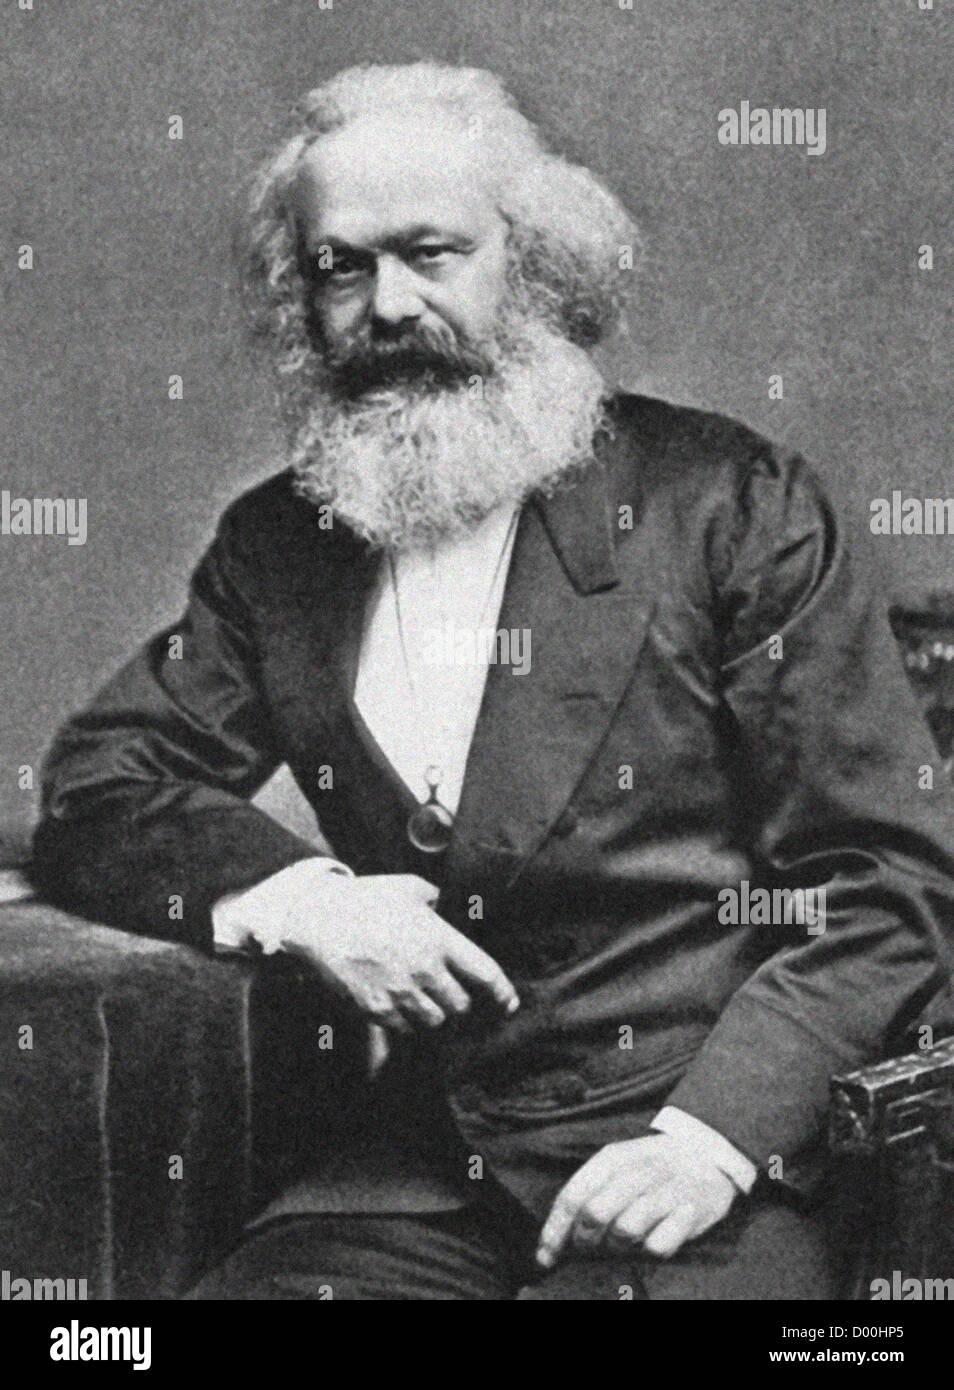 Karl Heinrich Marx was a German philosopher, economist, sociologist, historian, journalist, and revolutionary socialist. - Stock Image